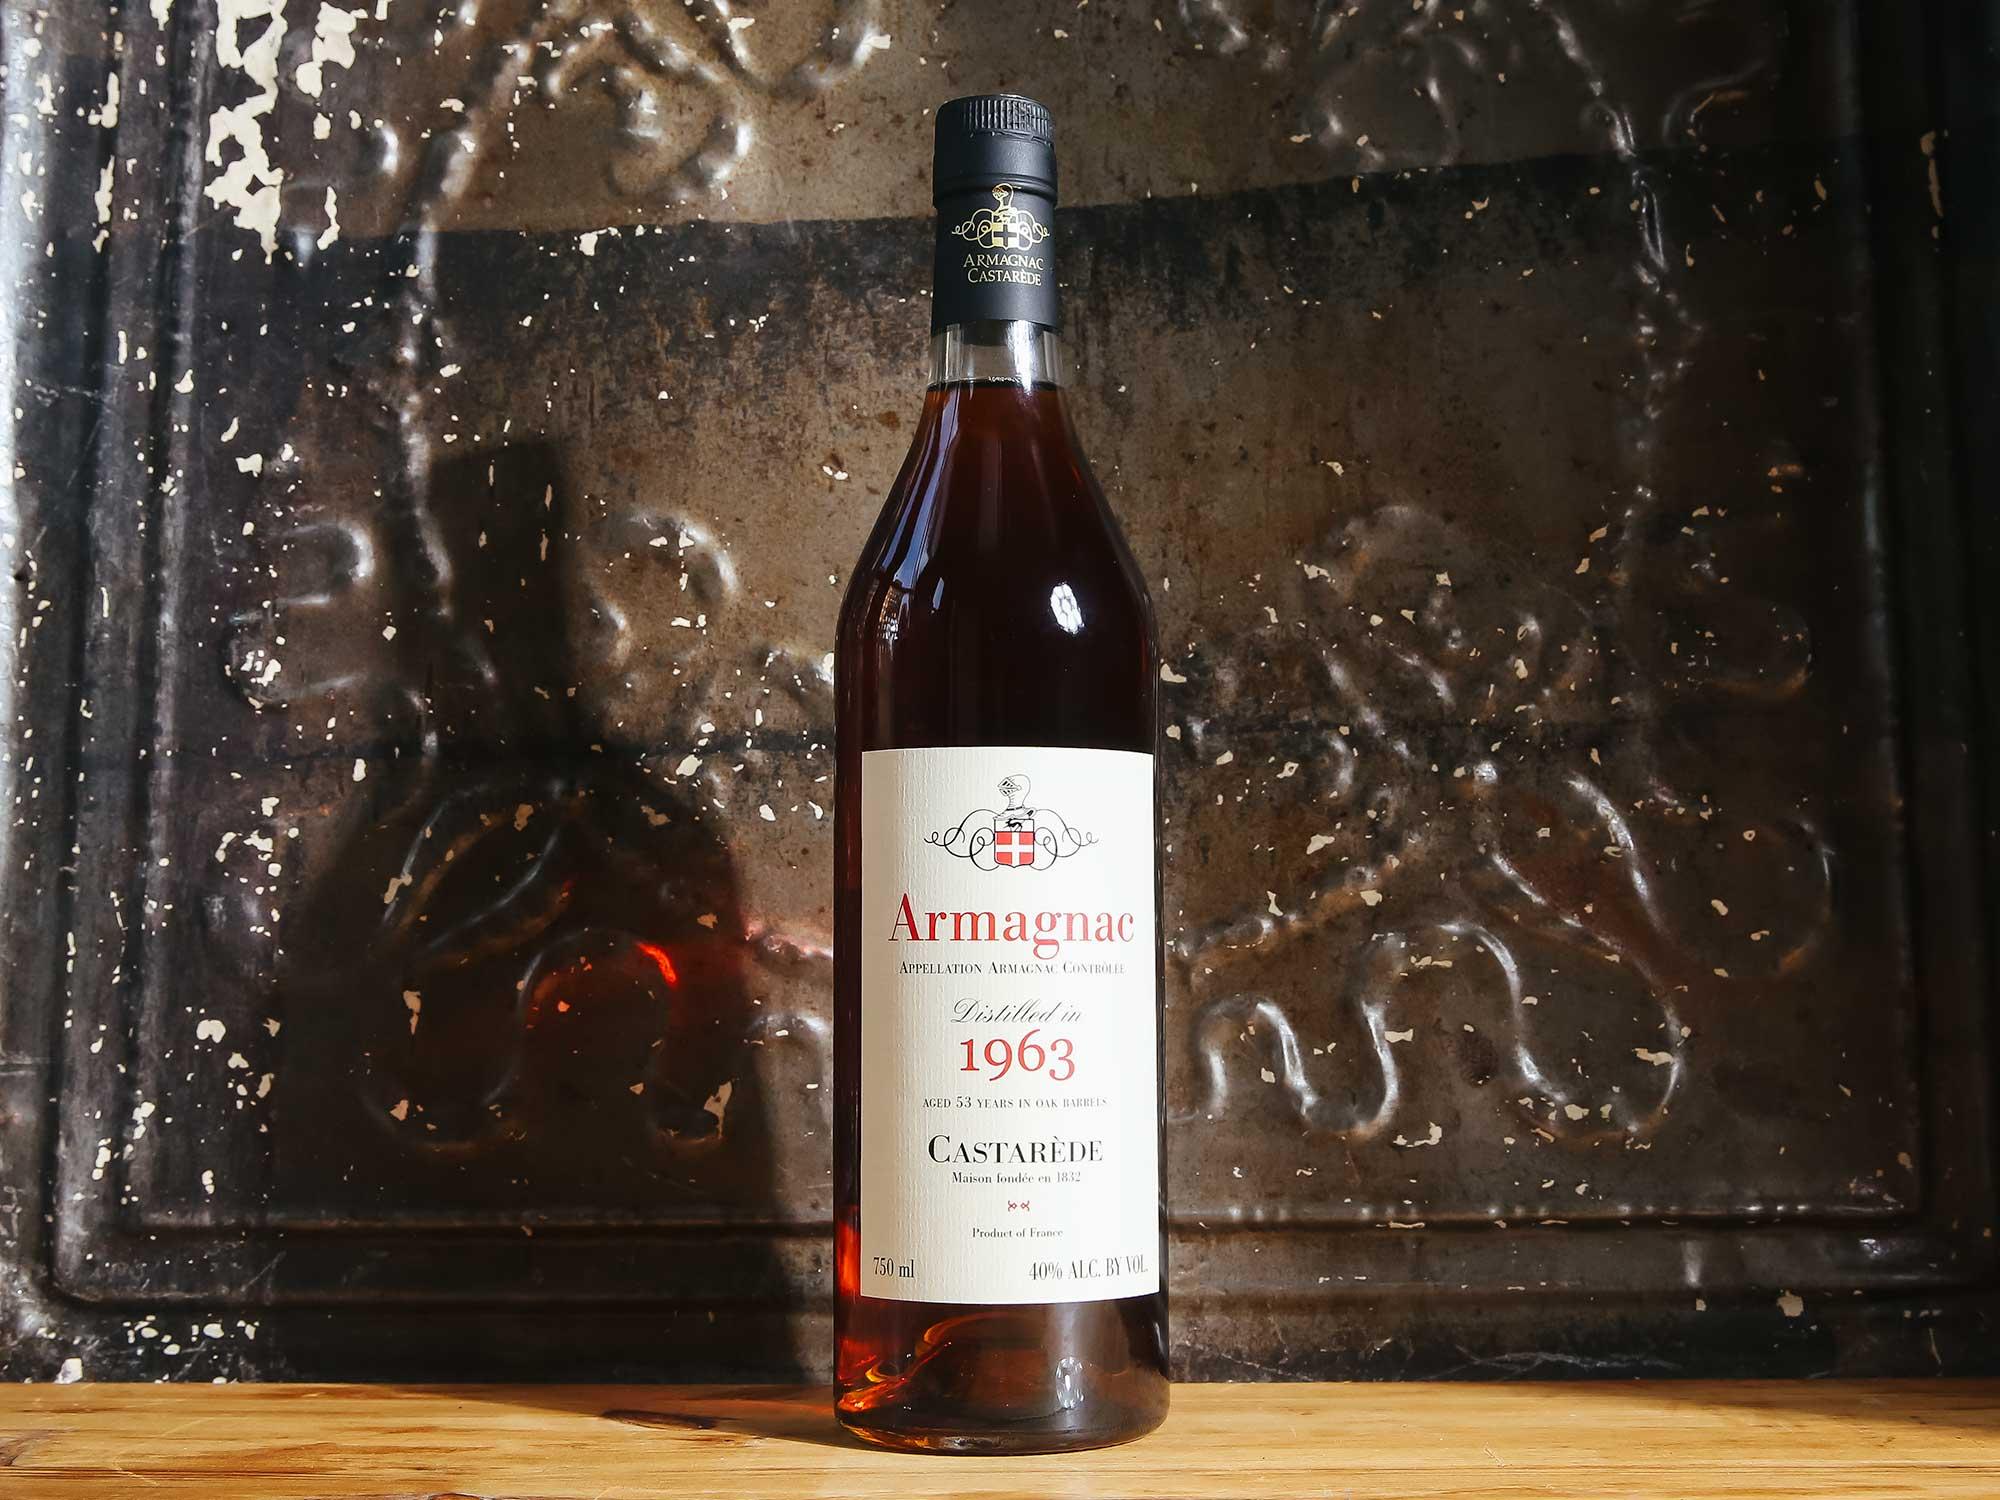 Castarède 1963 Armagnac